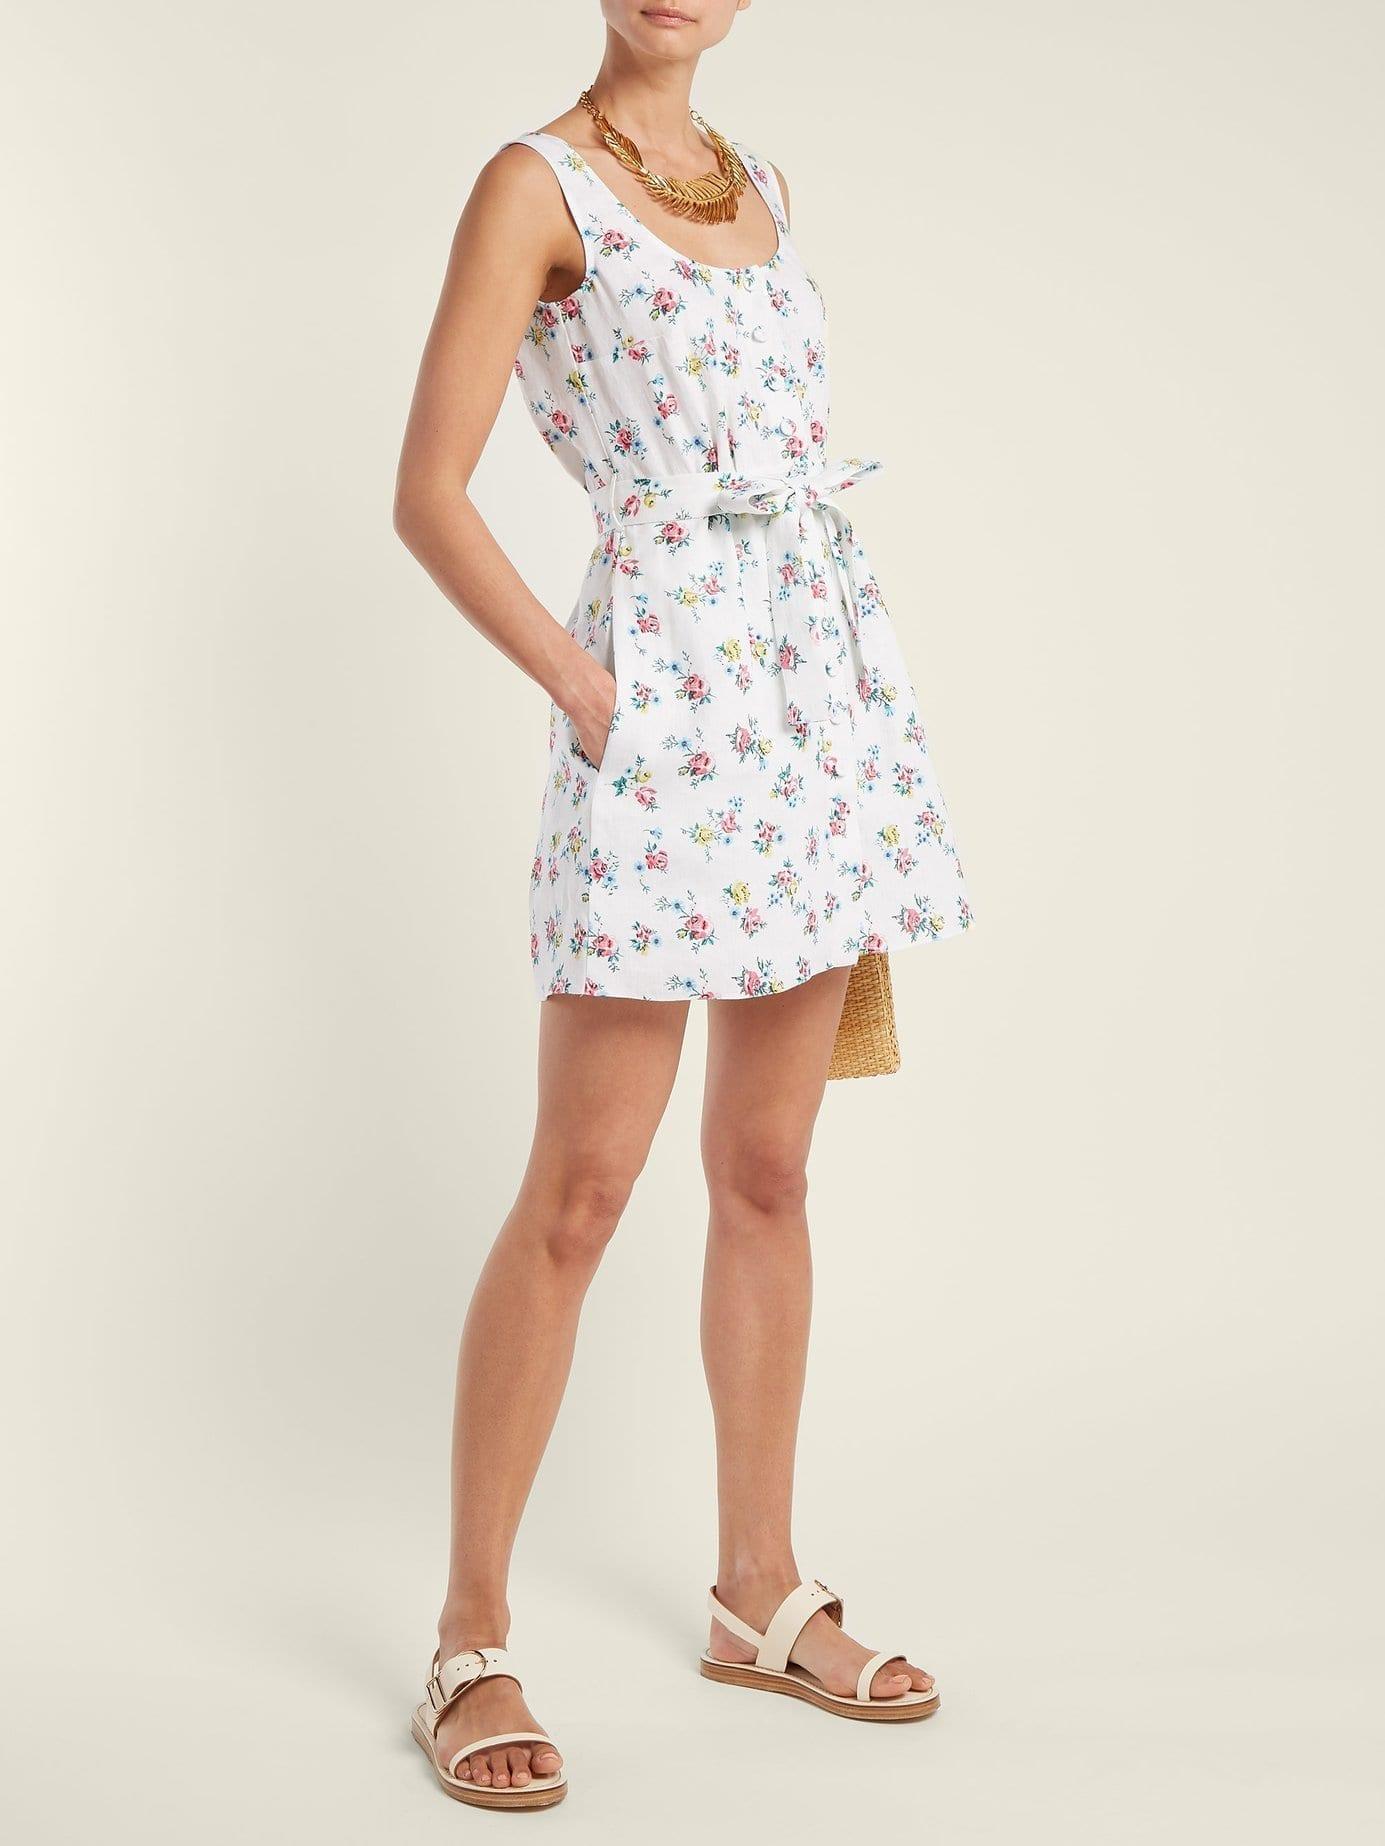 EMILIA WICKSTEAD Kirk Linen White / Floral Printed Dress